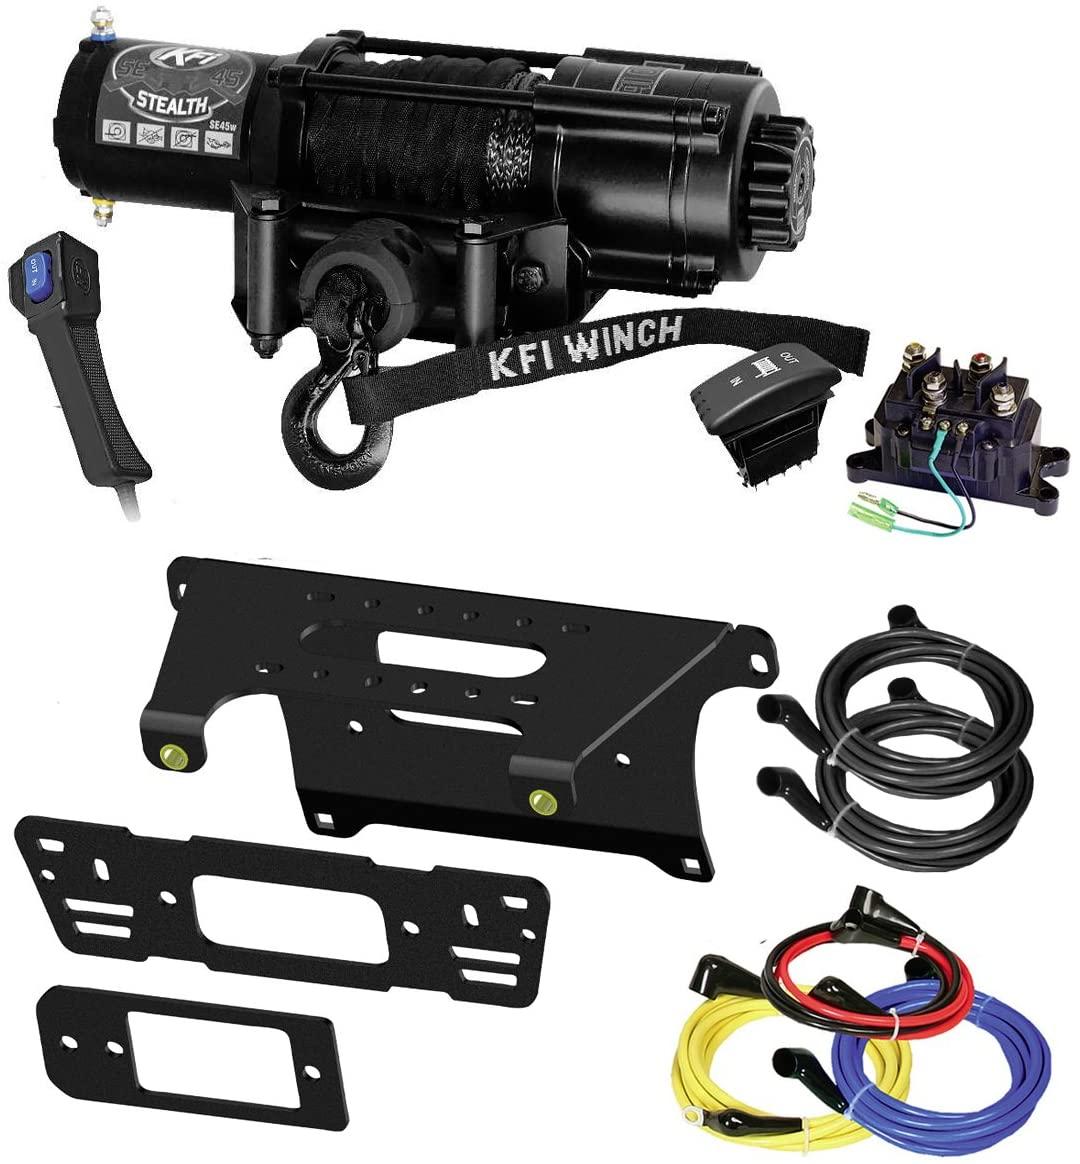 KFI Combo Kit - SE45w-R2 4500lbs Winch & Mount Bracket - compatible with 2014-2018 Polaris 900 Ranger Crew 4x4